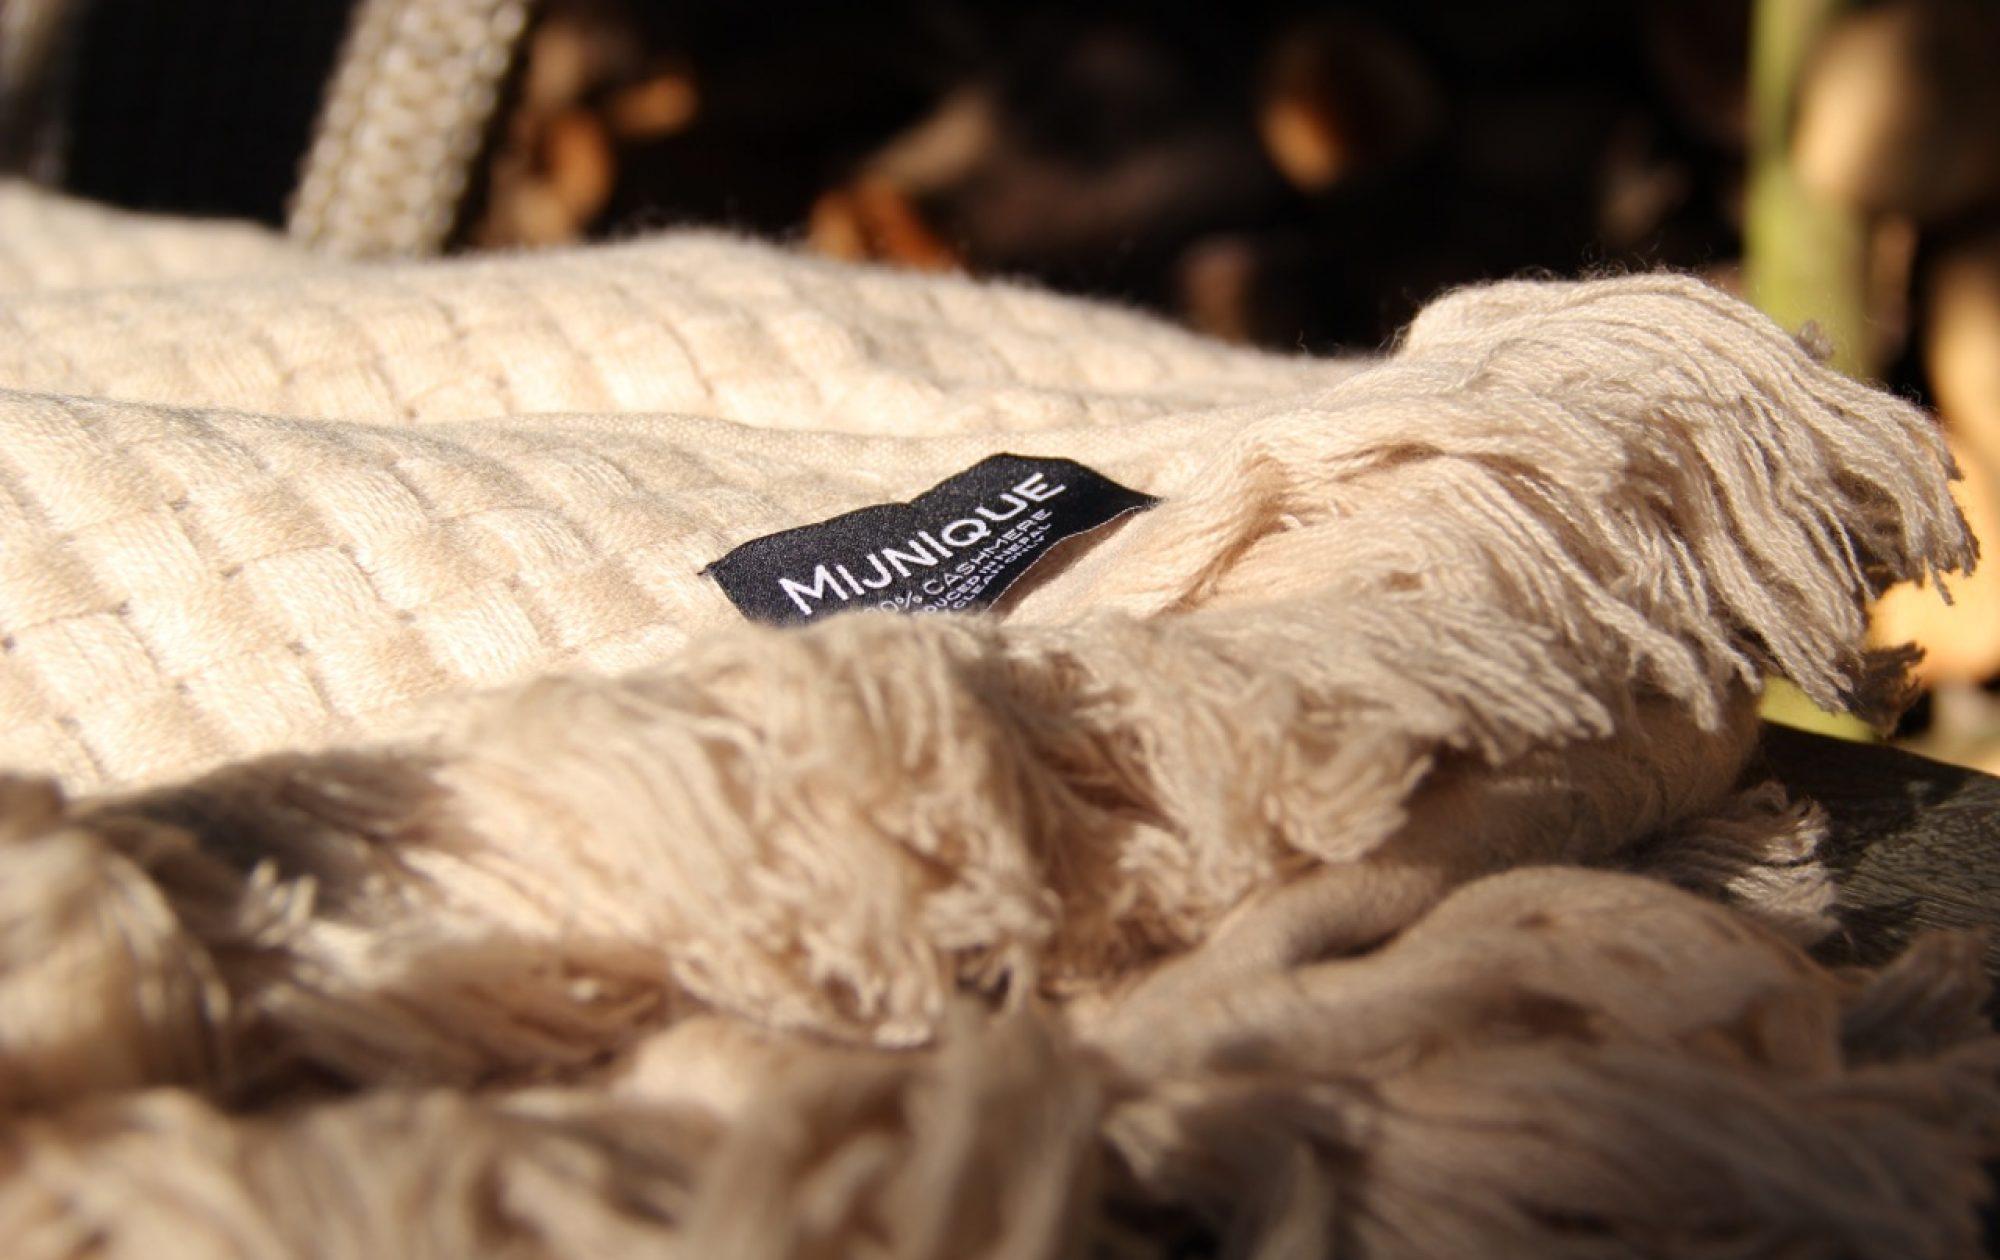 Mijnique cashmere kasjmier sjaals